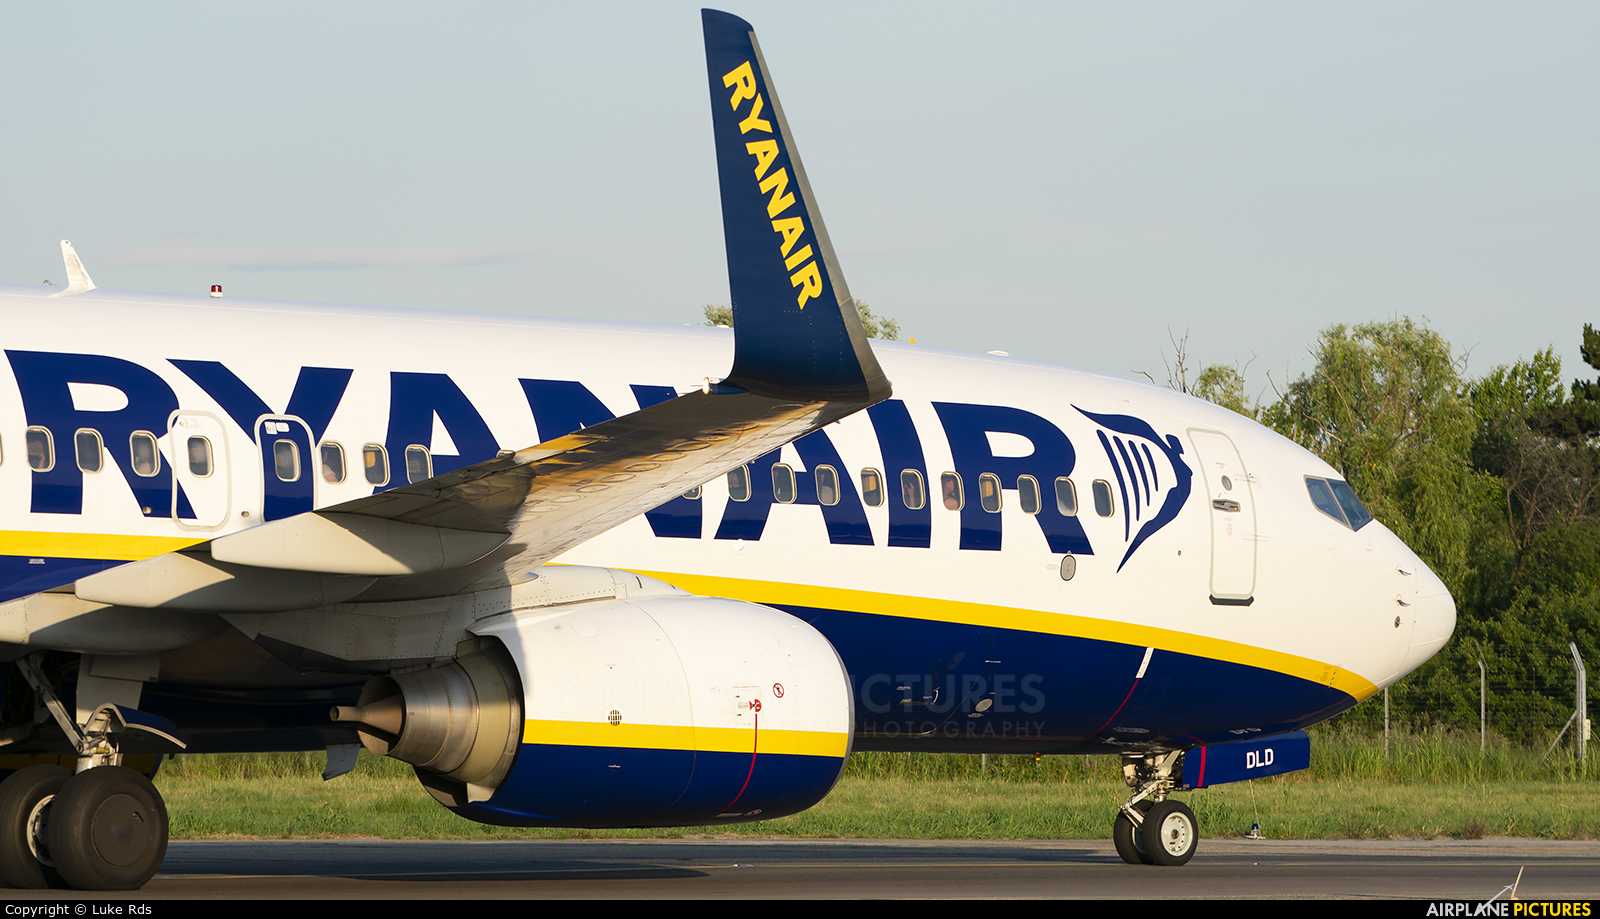 Ryanair EI-DLD aircraft at Bucharest - Henri Coandă